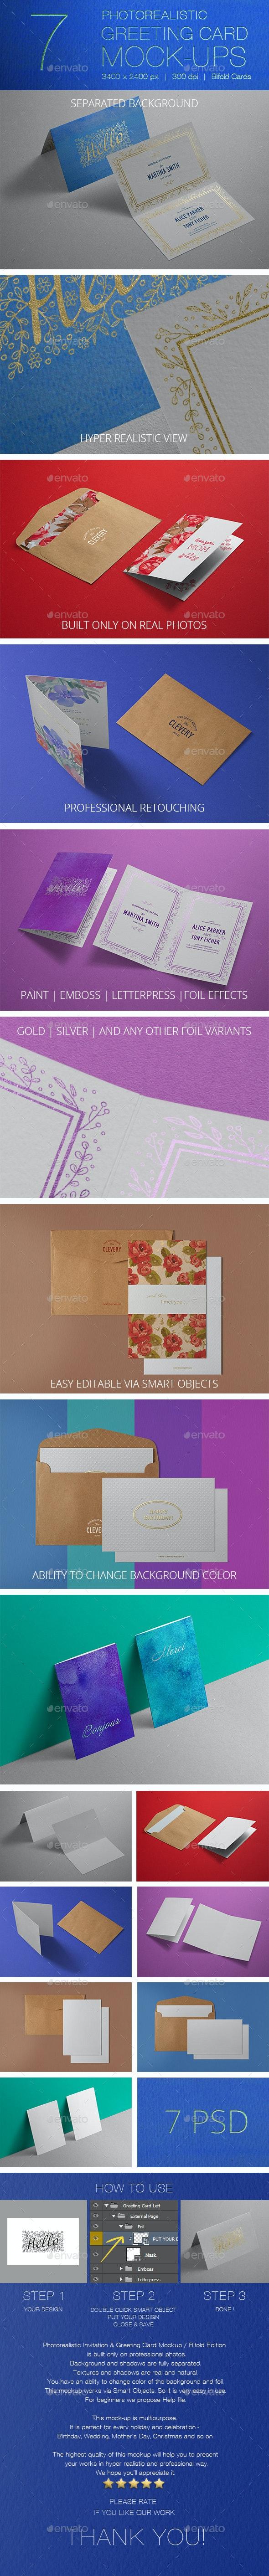 Photorealistic Invitation & Greeting Card Mockup / Bifold Edition - Miscellaneous Print